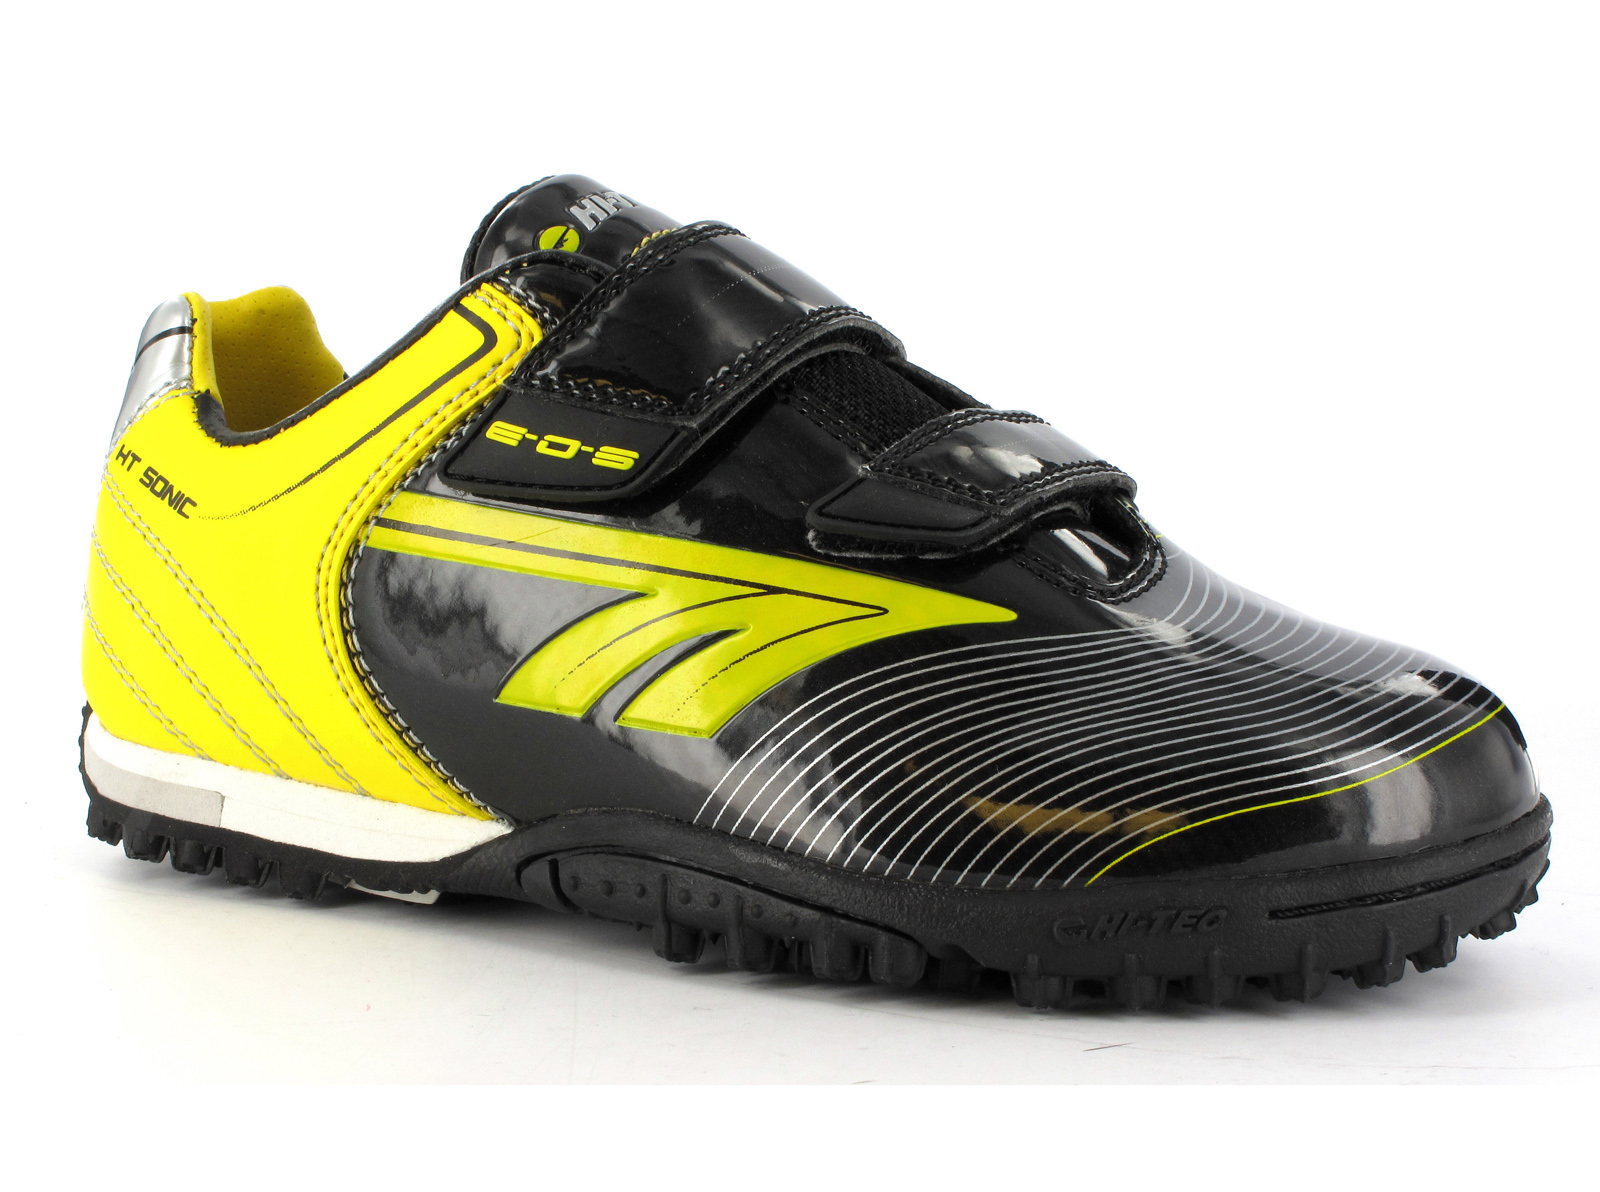 New-Boys-Hi-Tec-EOS-Velcro-Astro-Turf-Football-Soccer-Velcro-Boots-Size-10-6-UK